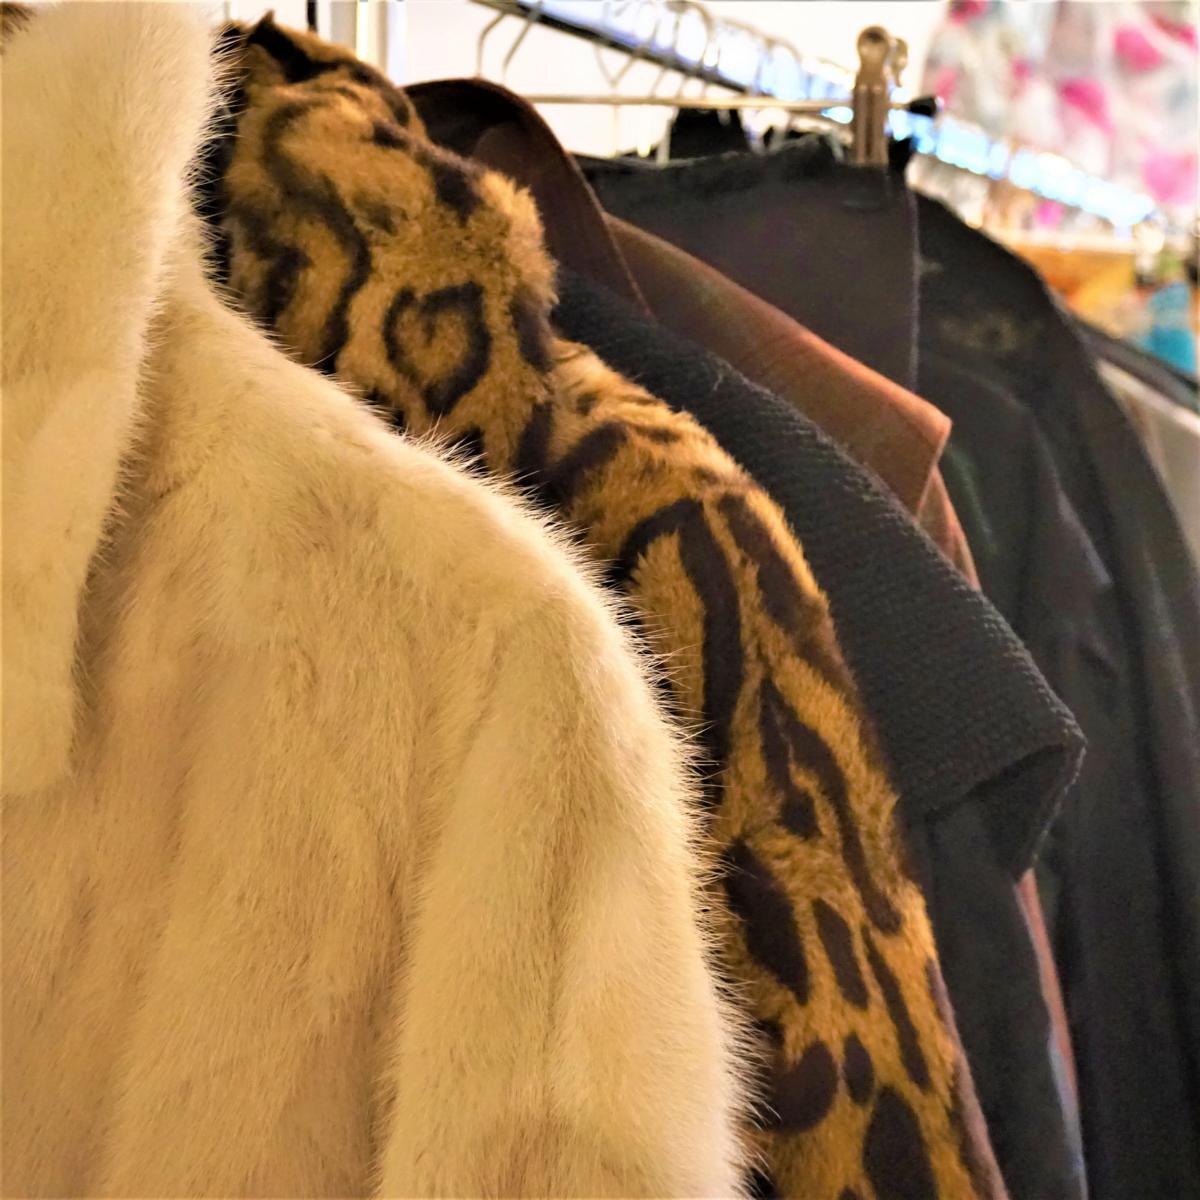 Style Hannover Museum für textile Kunst 3 - Museum für Textile Kunst: Tipp für echte Fashionfans